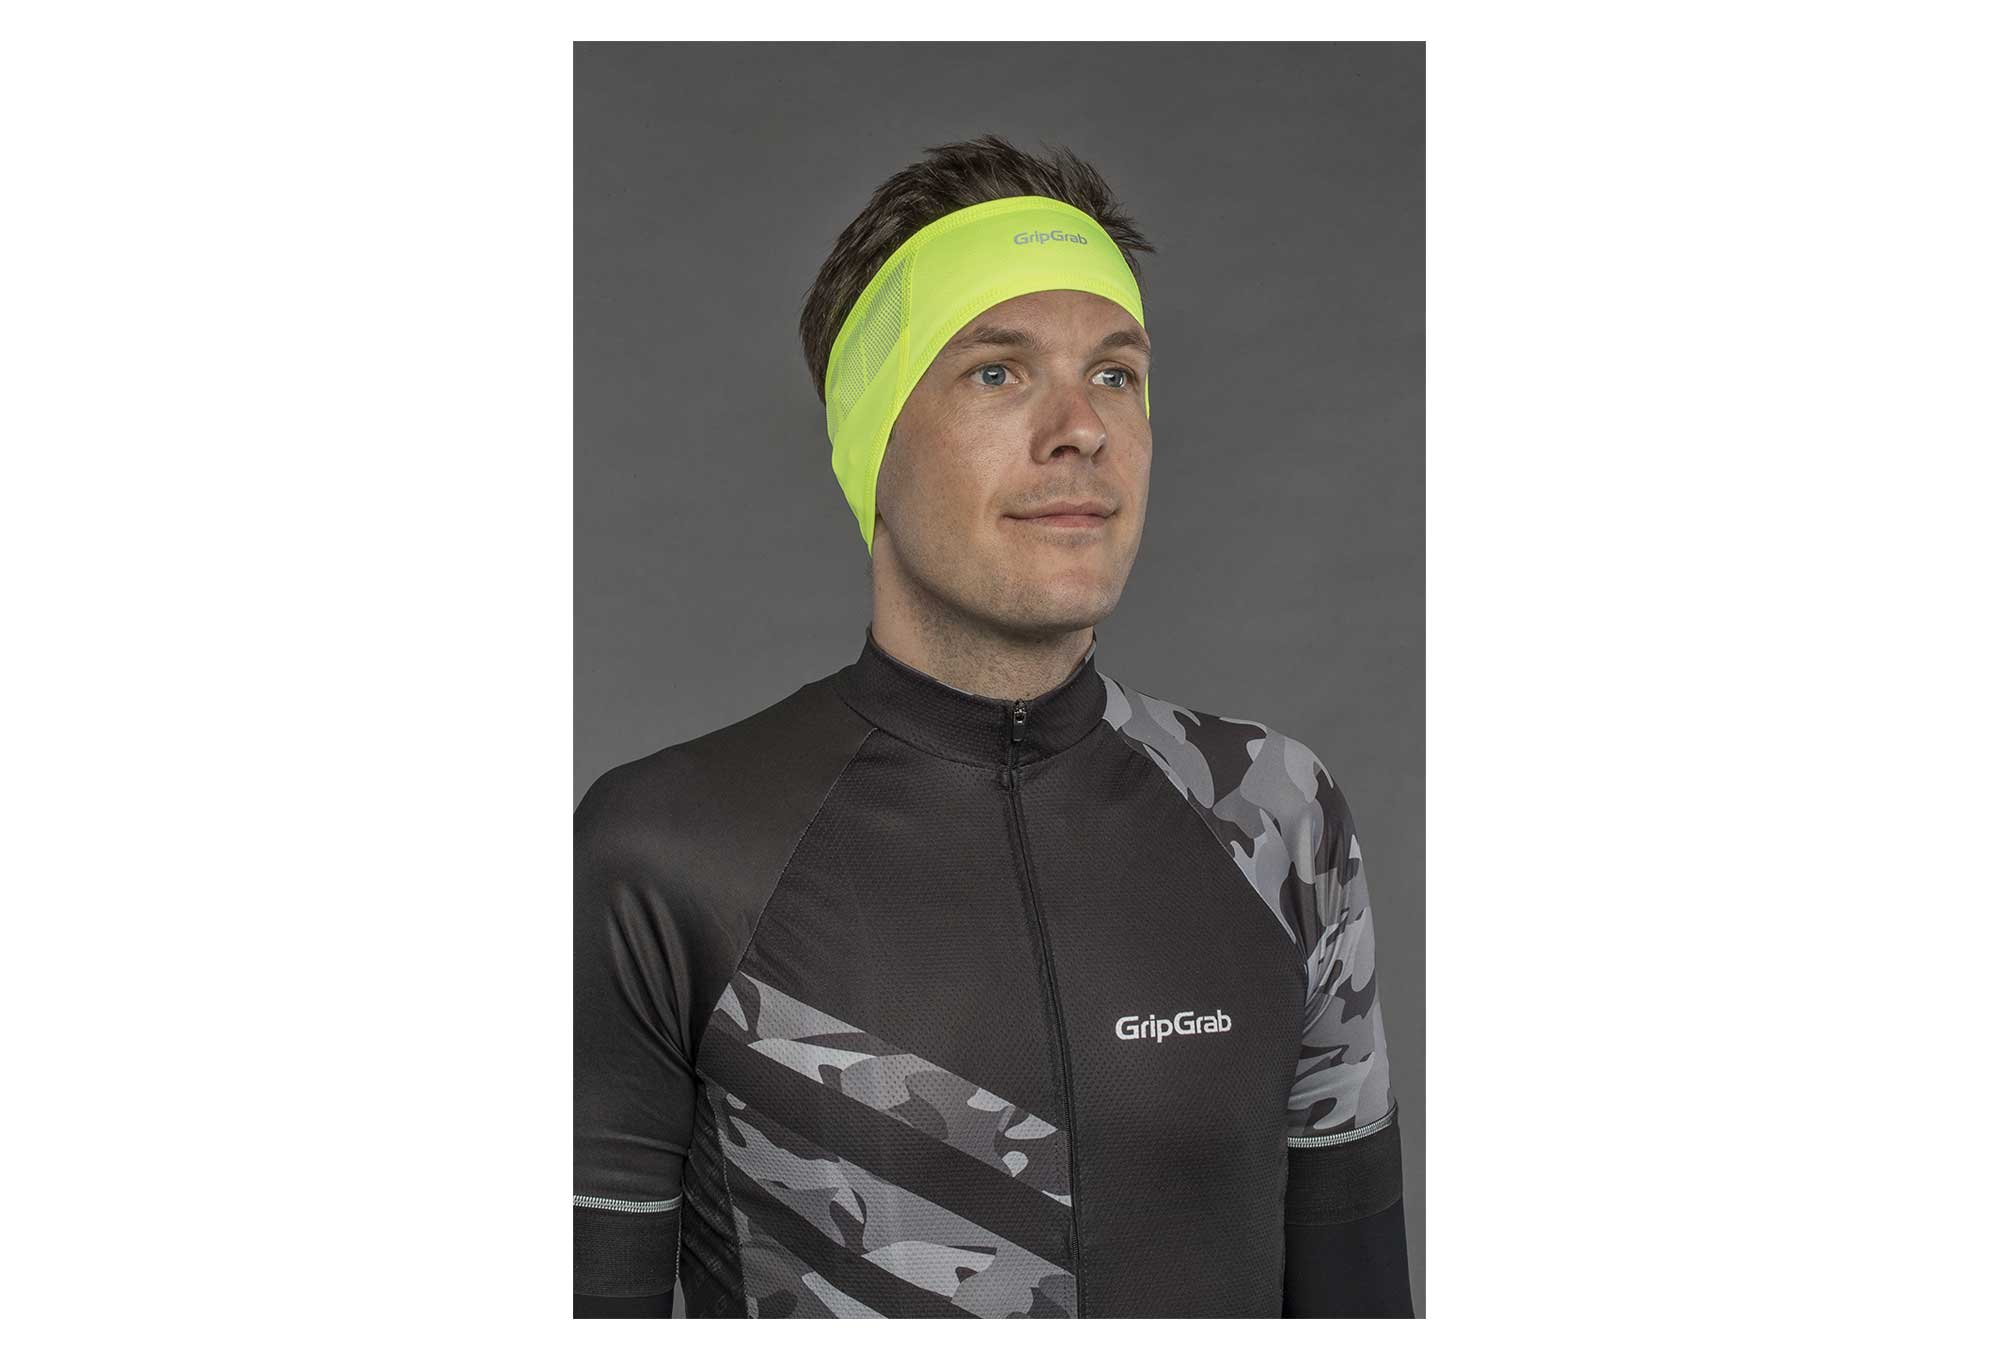 GripGrab Windproof Headband